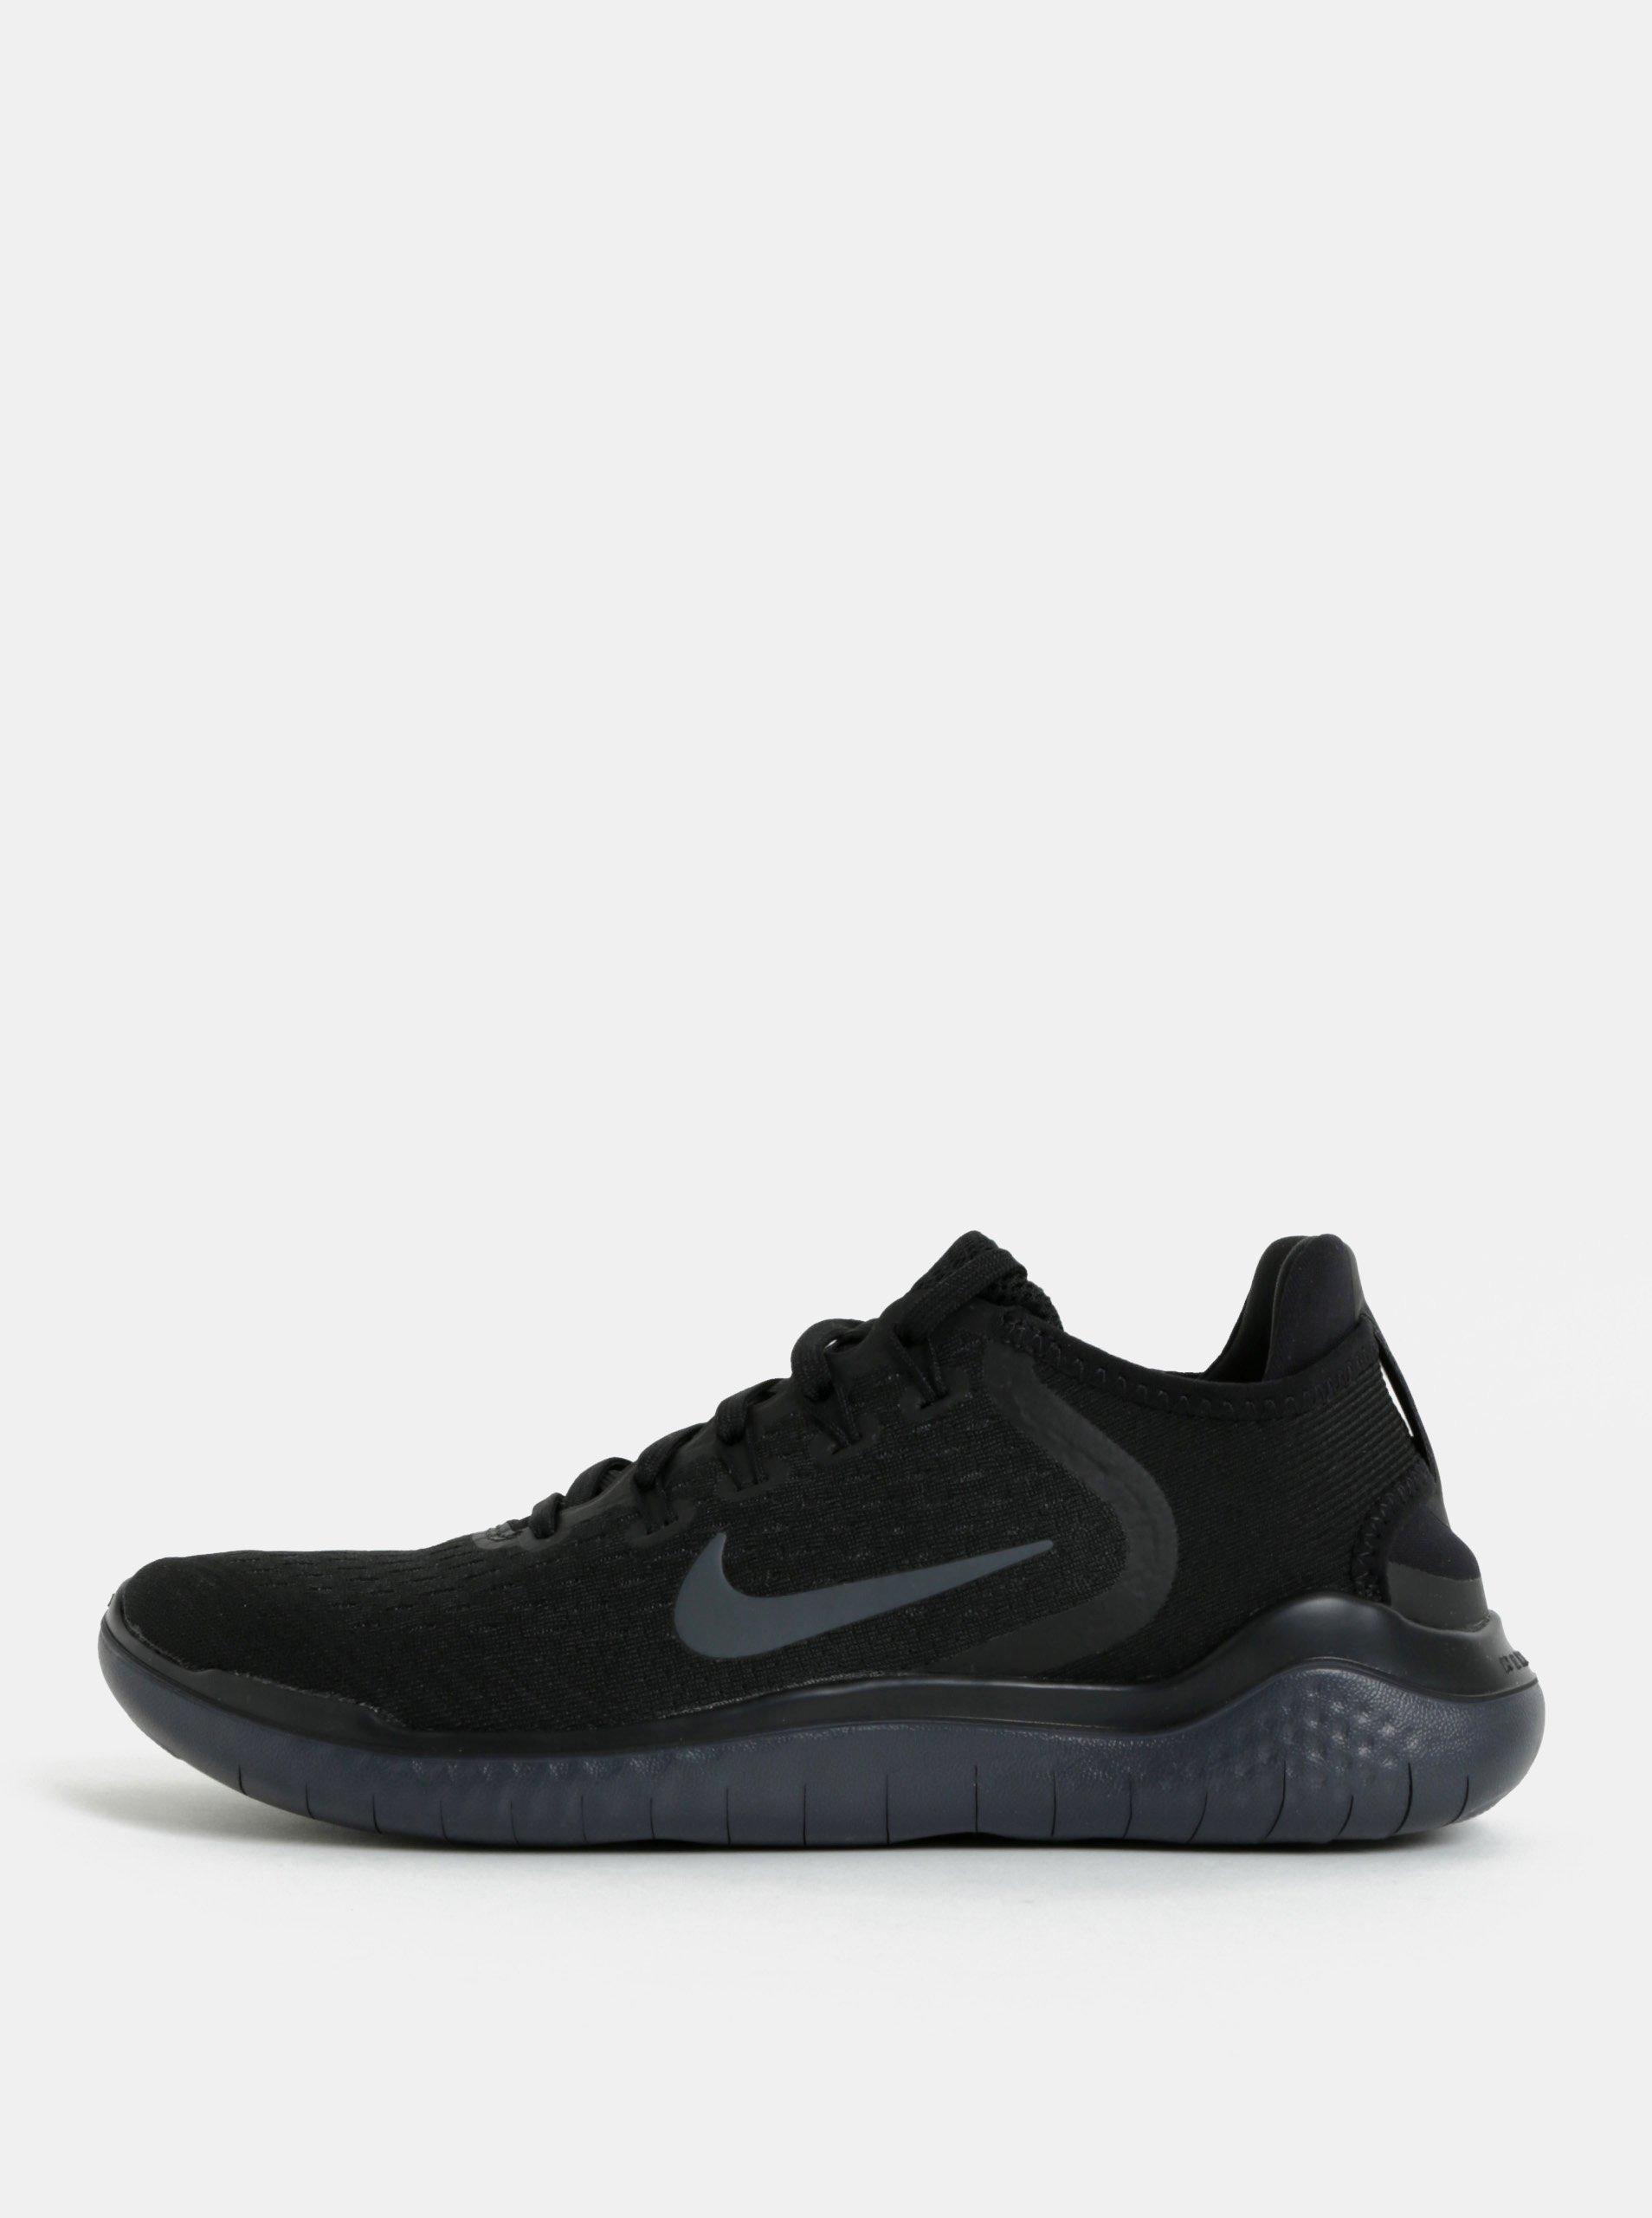 Čierne dámske tenisky Nike Free RN 2018